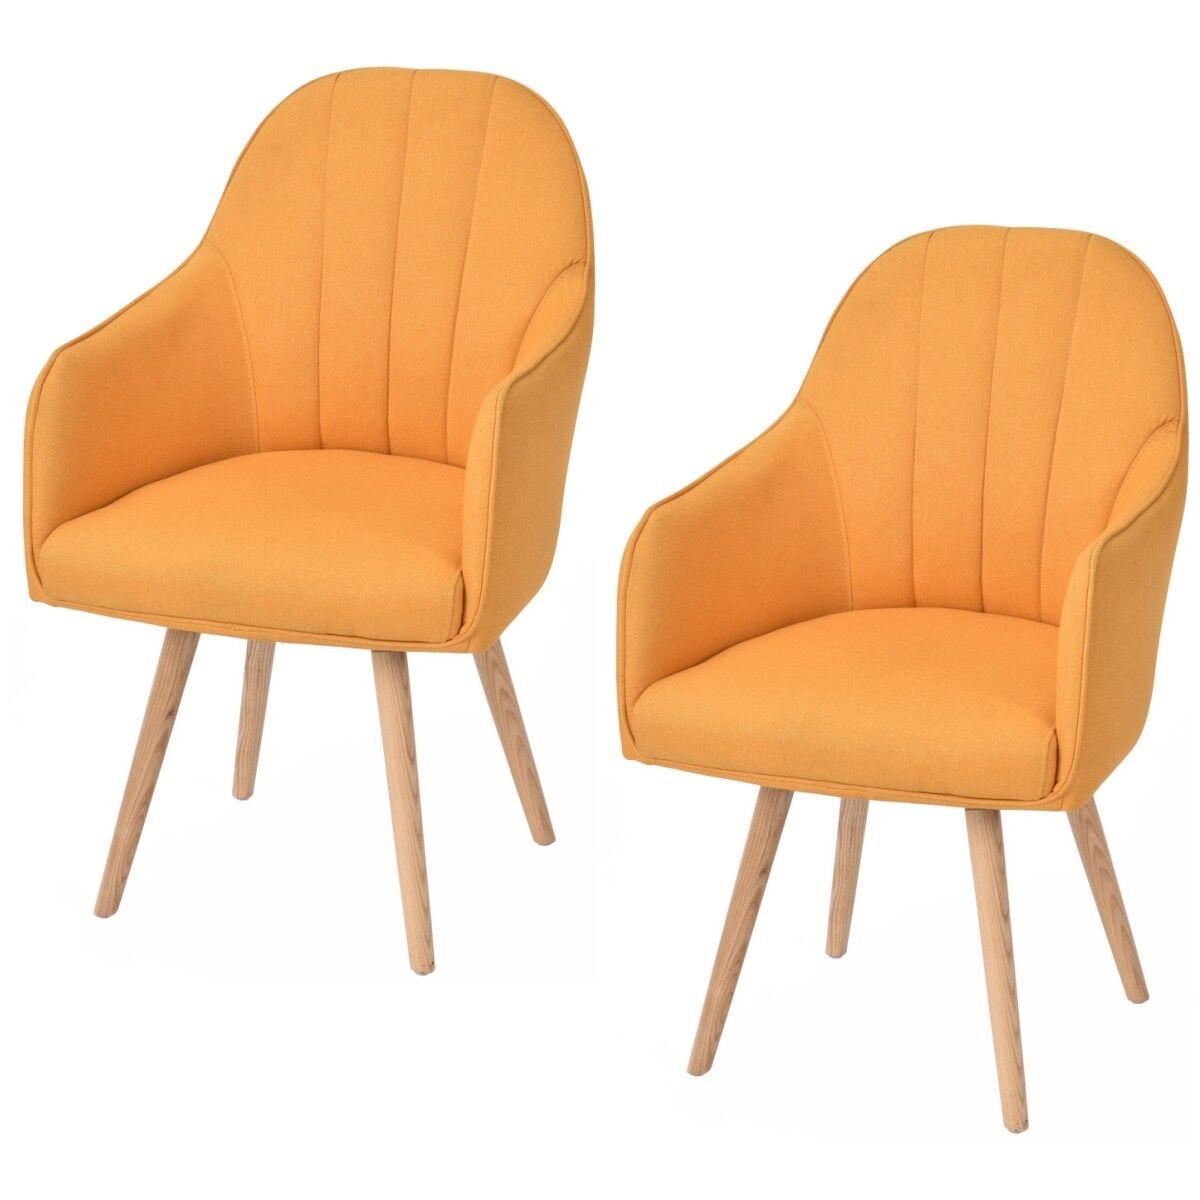 2x Esszimmerstuhl Lehnstuhl Armlehnenstuhl Küchenstuhl Stuhl Sessel Stoff Orange